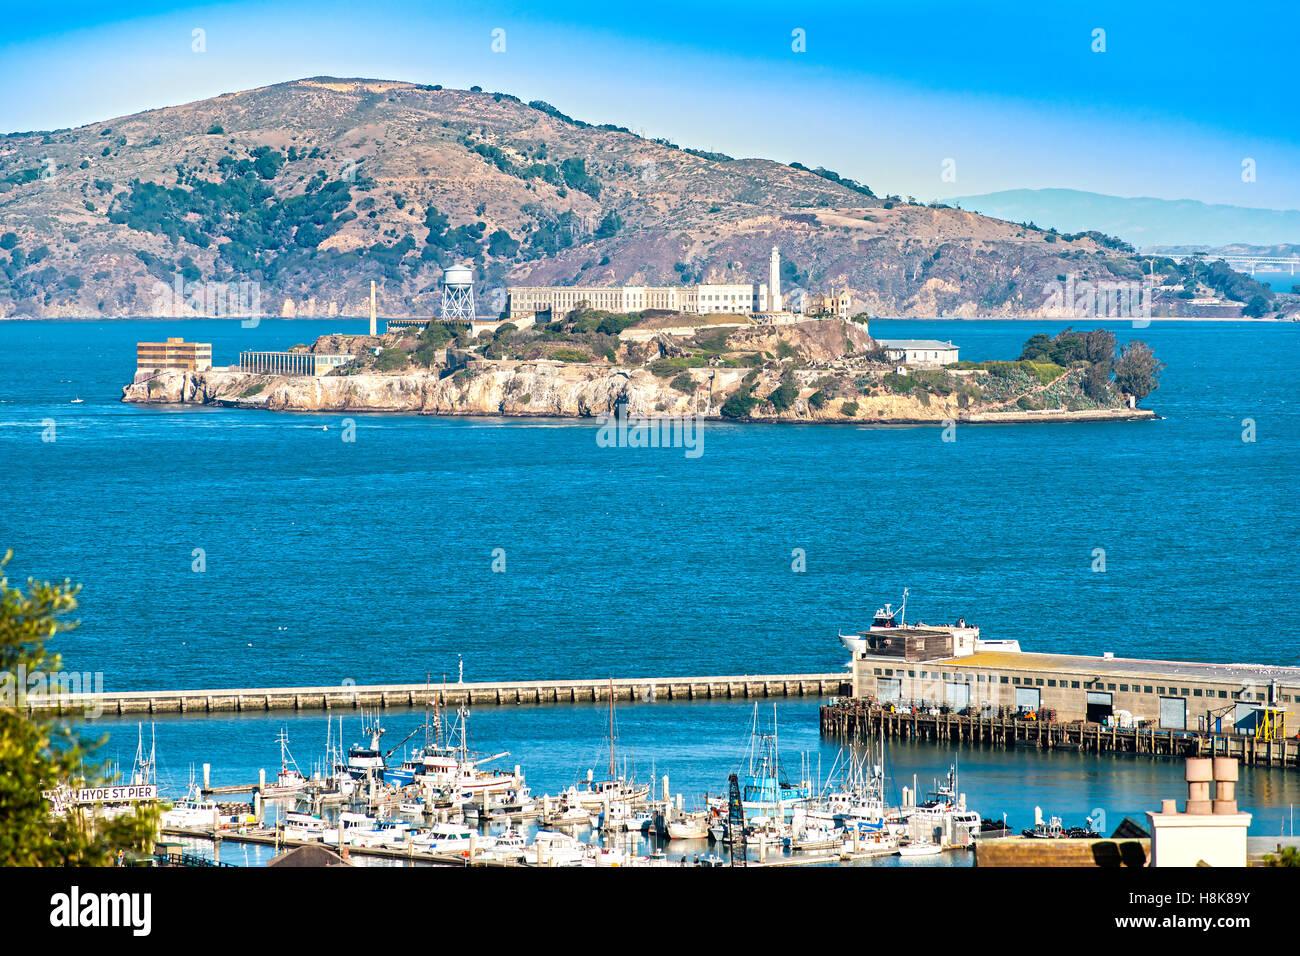 Alcatraz Island in San Francisco, California, USA. Stock Photo